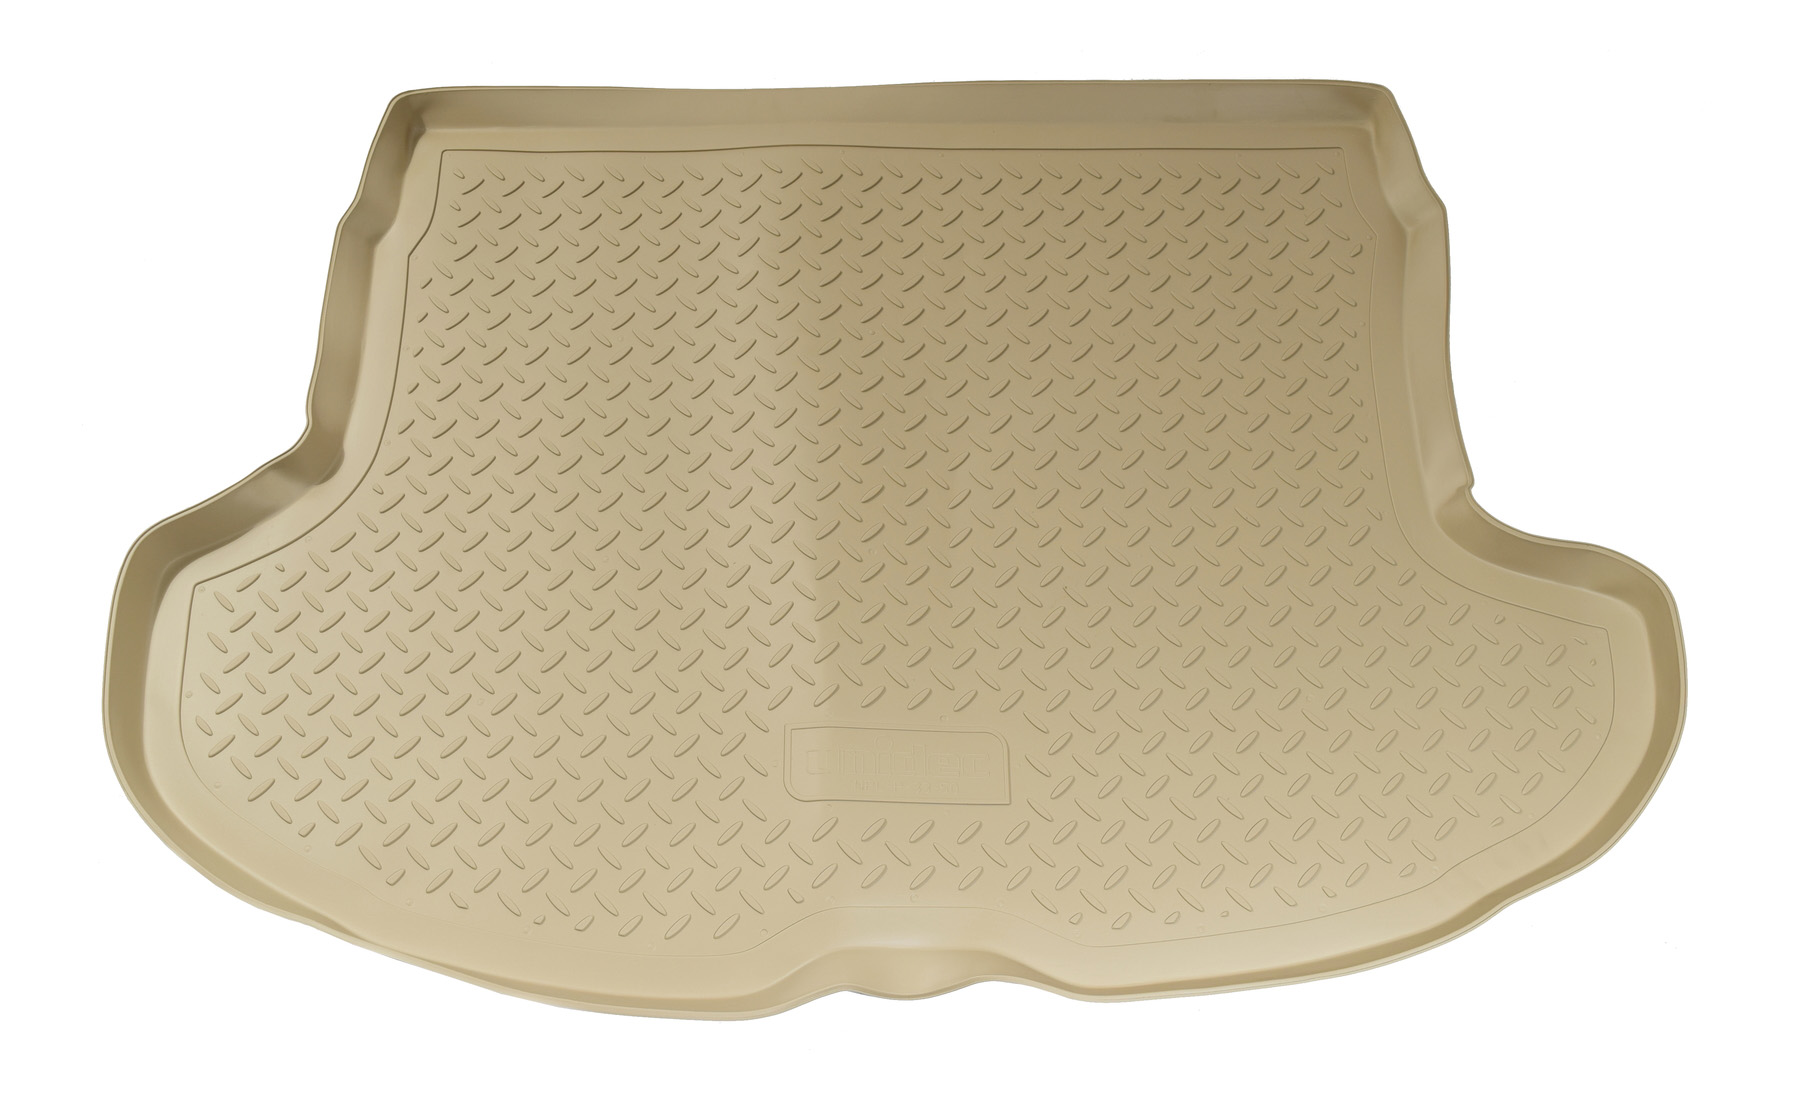 Коврик в багажник автомобиля для Infiniti Norplast (NPL-P-33-50Beige)